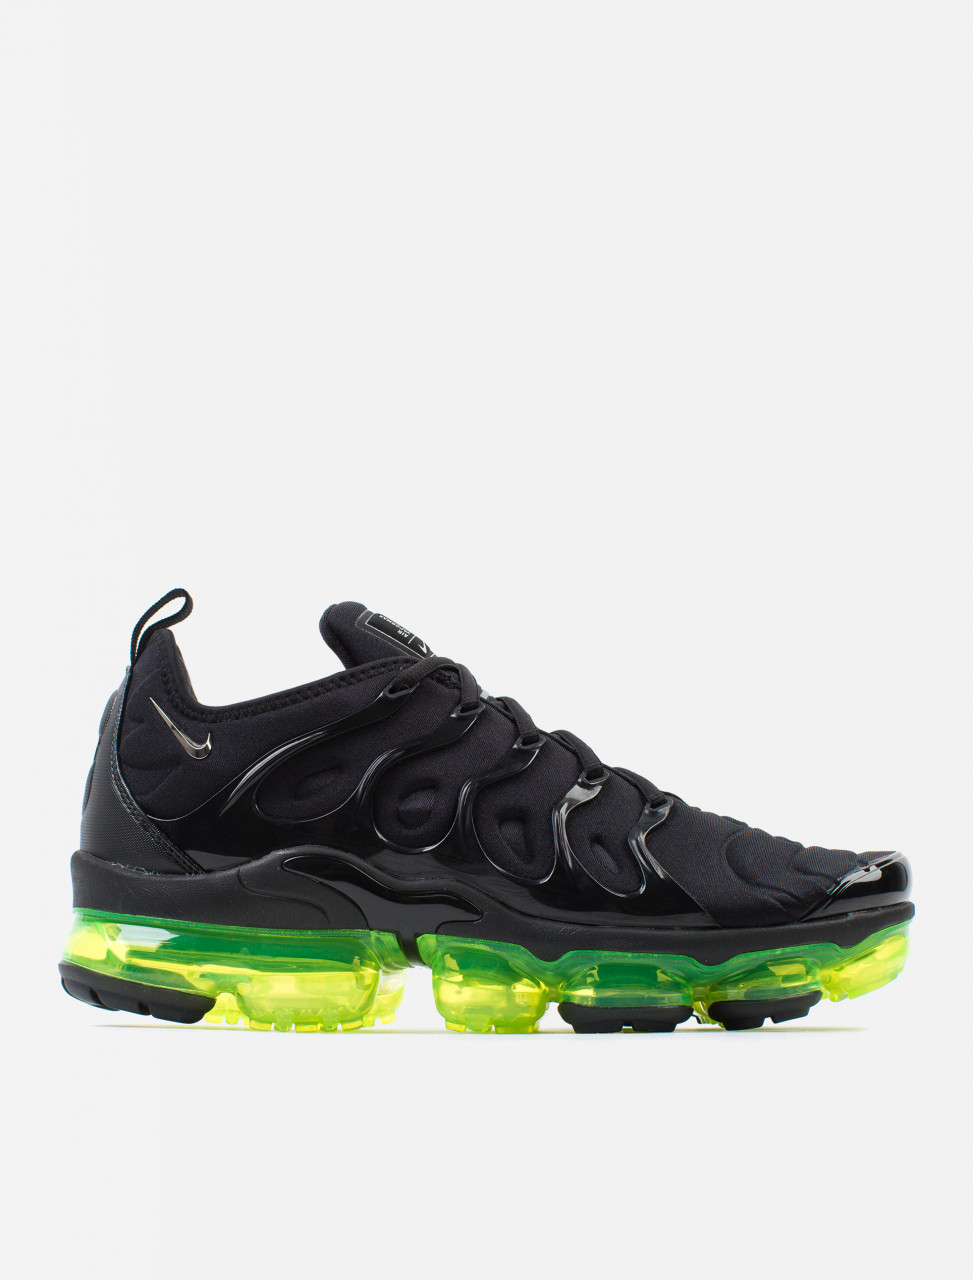 half off 974bc 5addd Air VaporMax Plus Sneaker